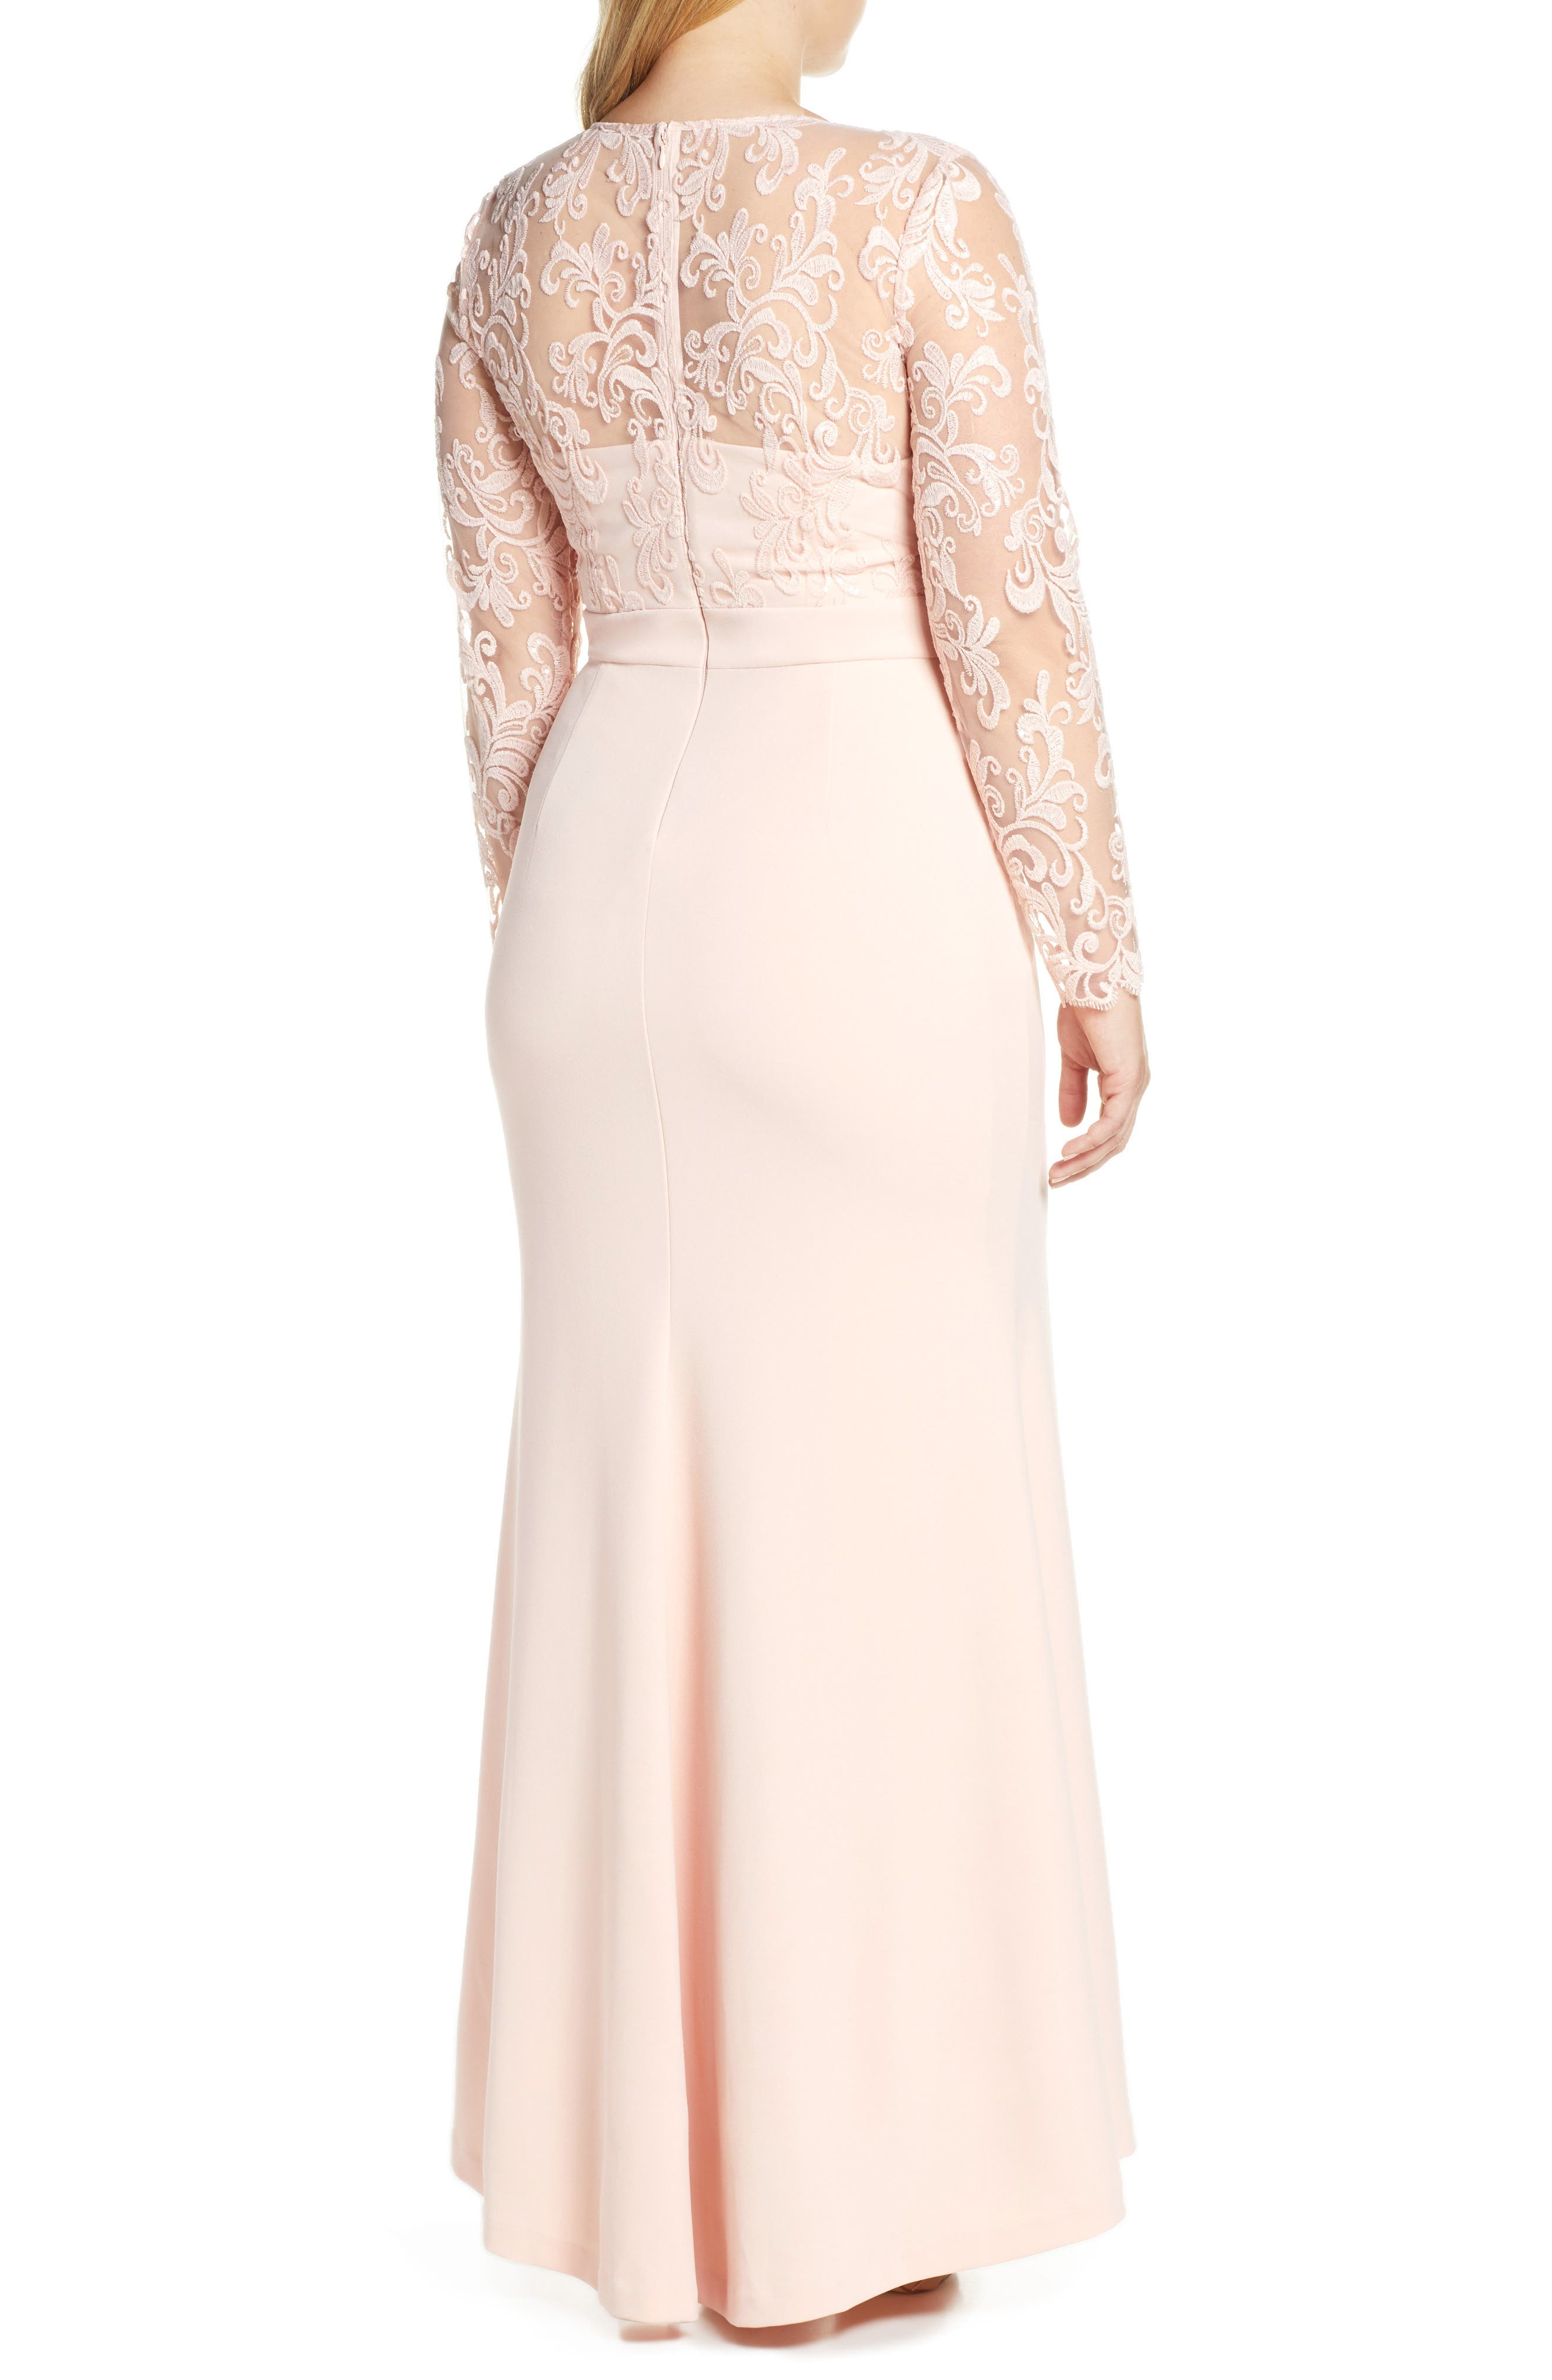 ELIZA J, Embroidered Bodice Crepe Evening Dress, Alternate thumbnail 9, color, BLUSH